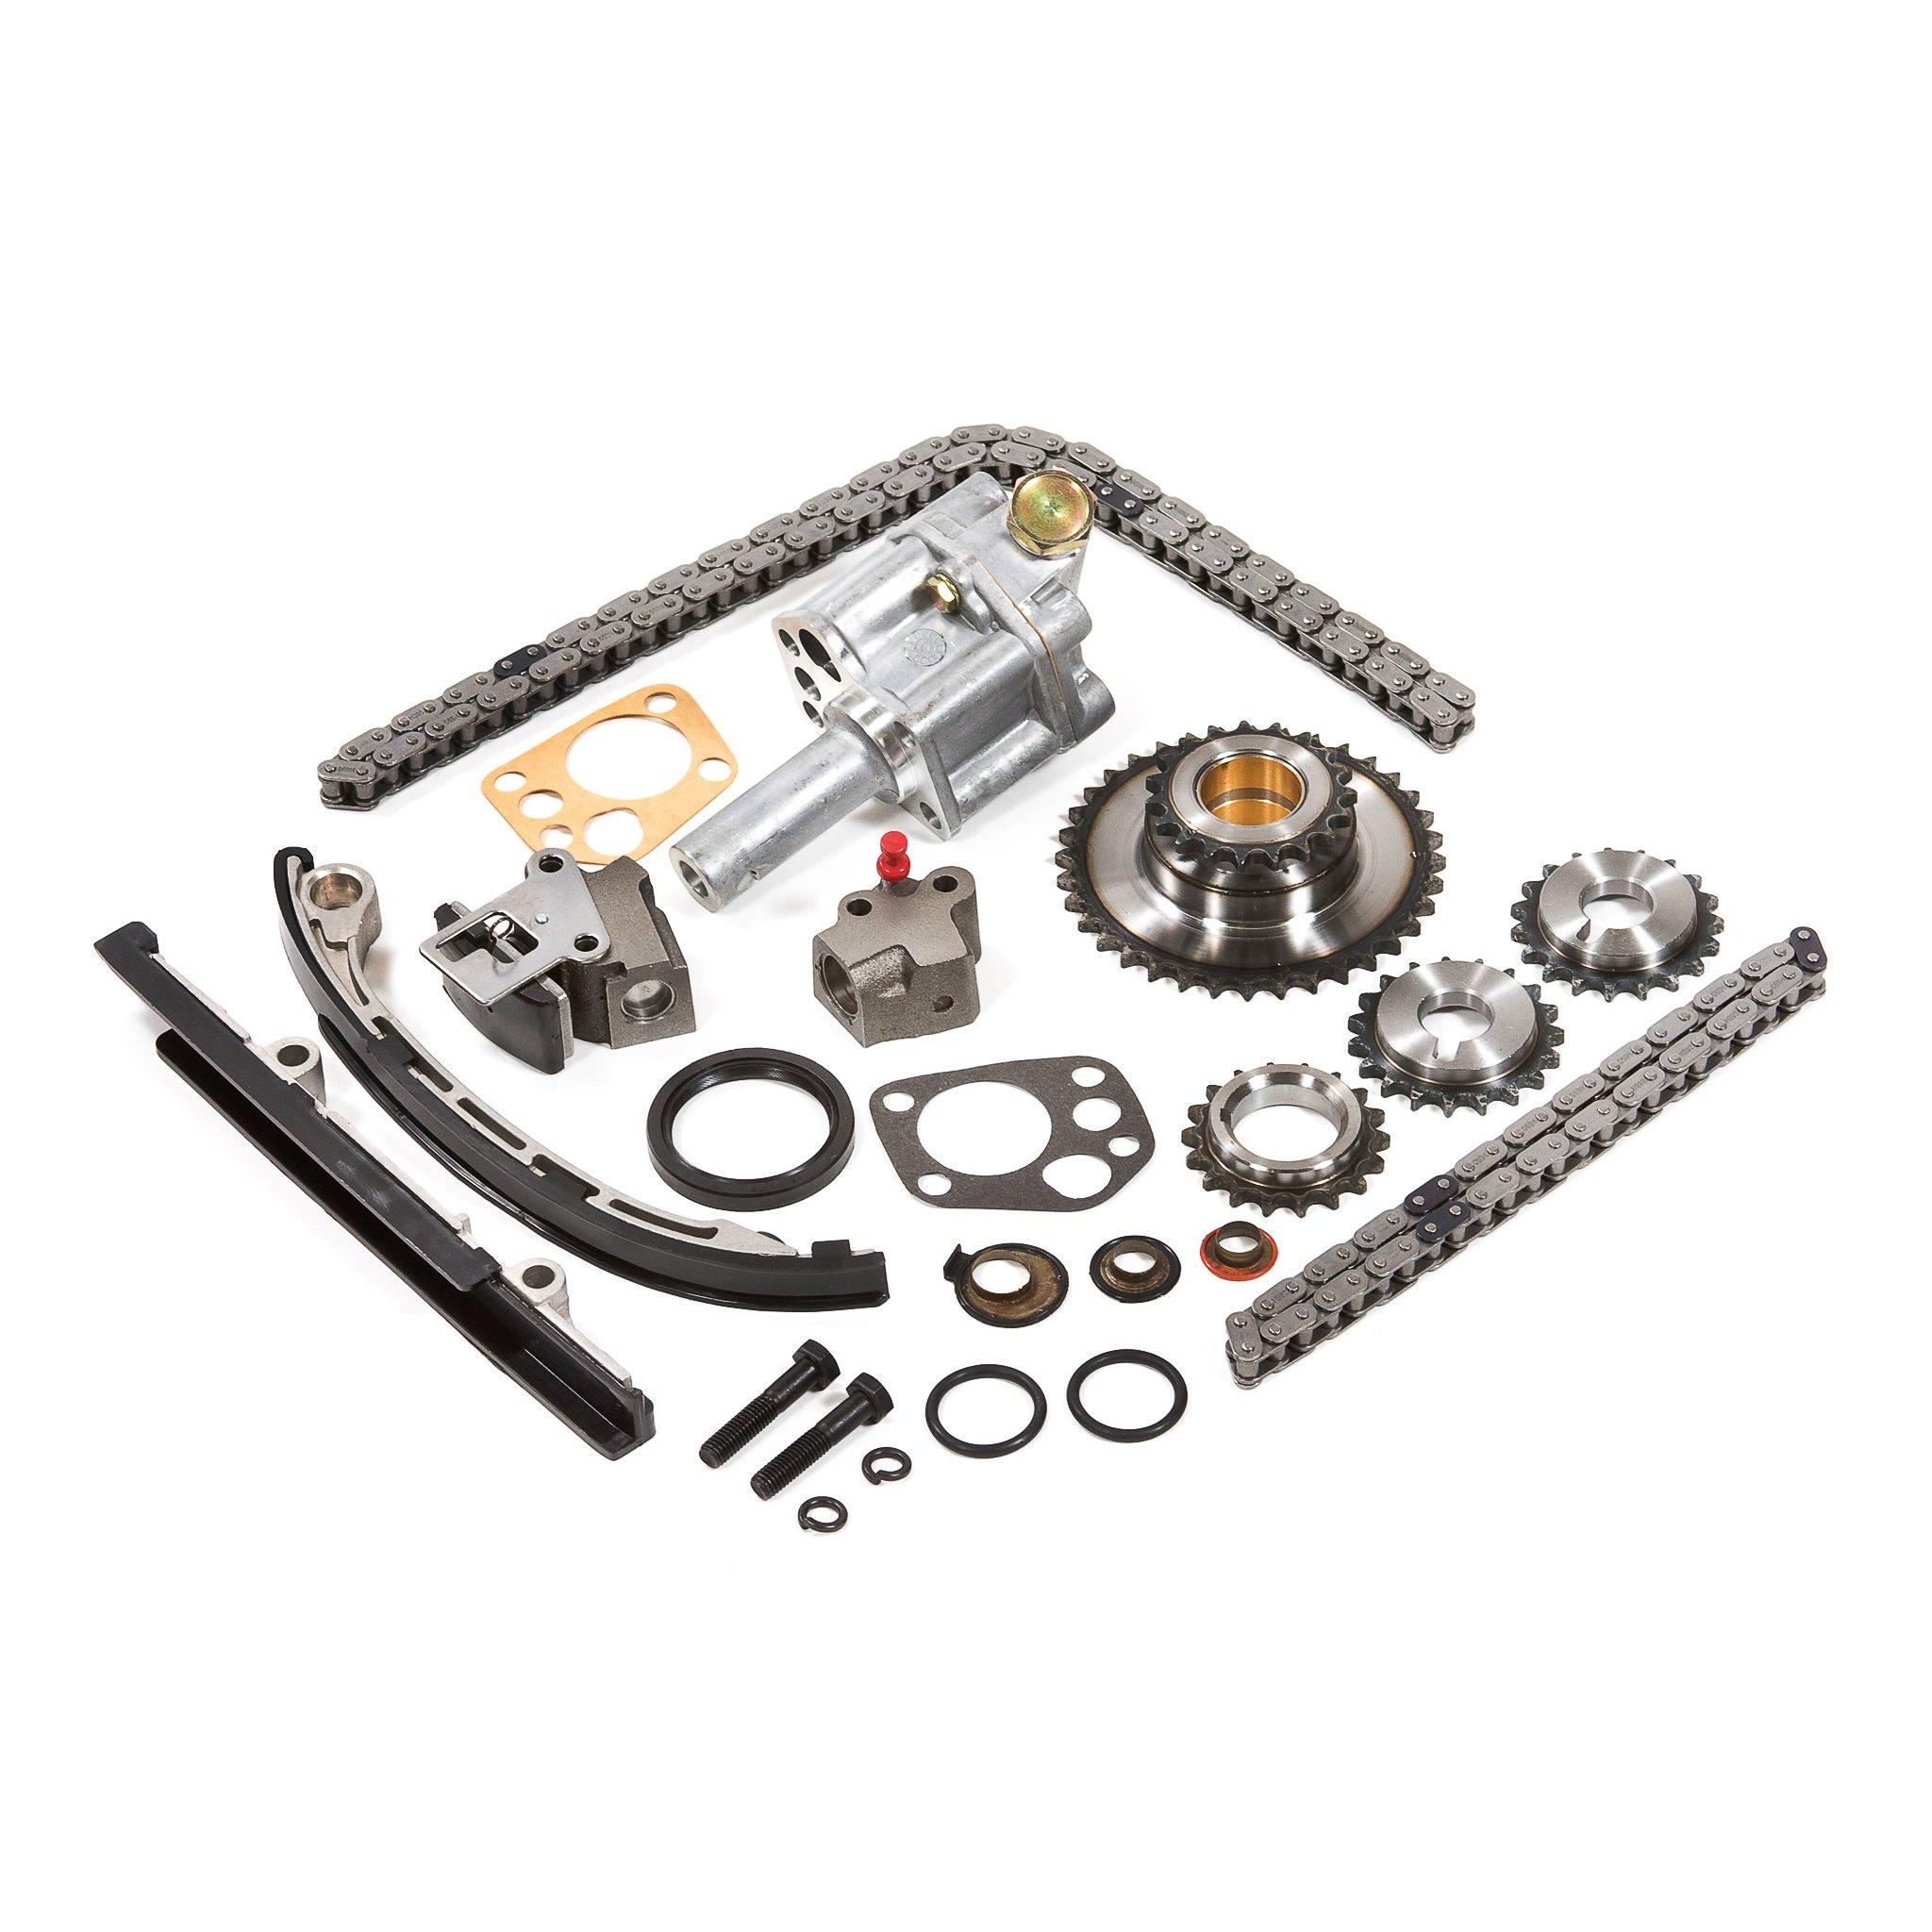 98 04 Nissan 2 4 Dohc 16v Ka24de Timing Chain Kit Oil Pump